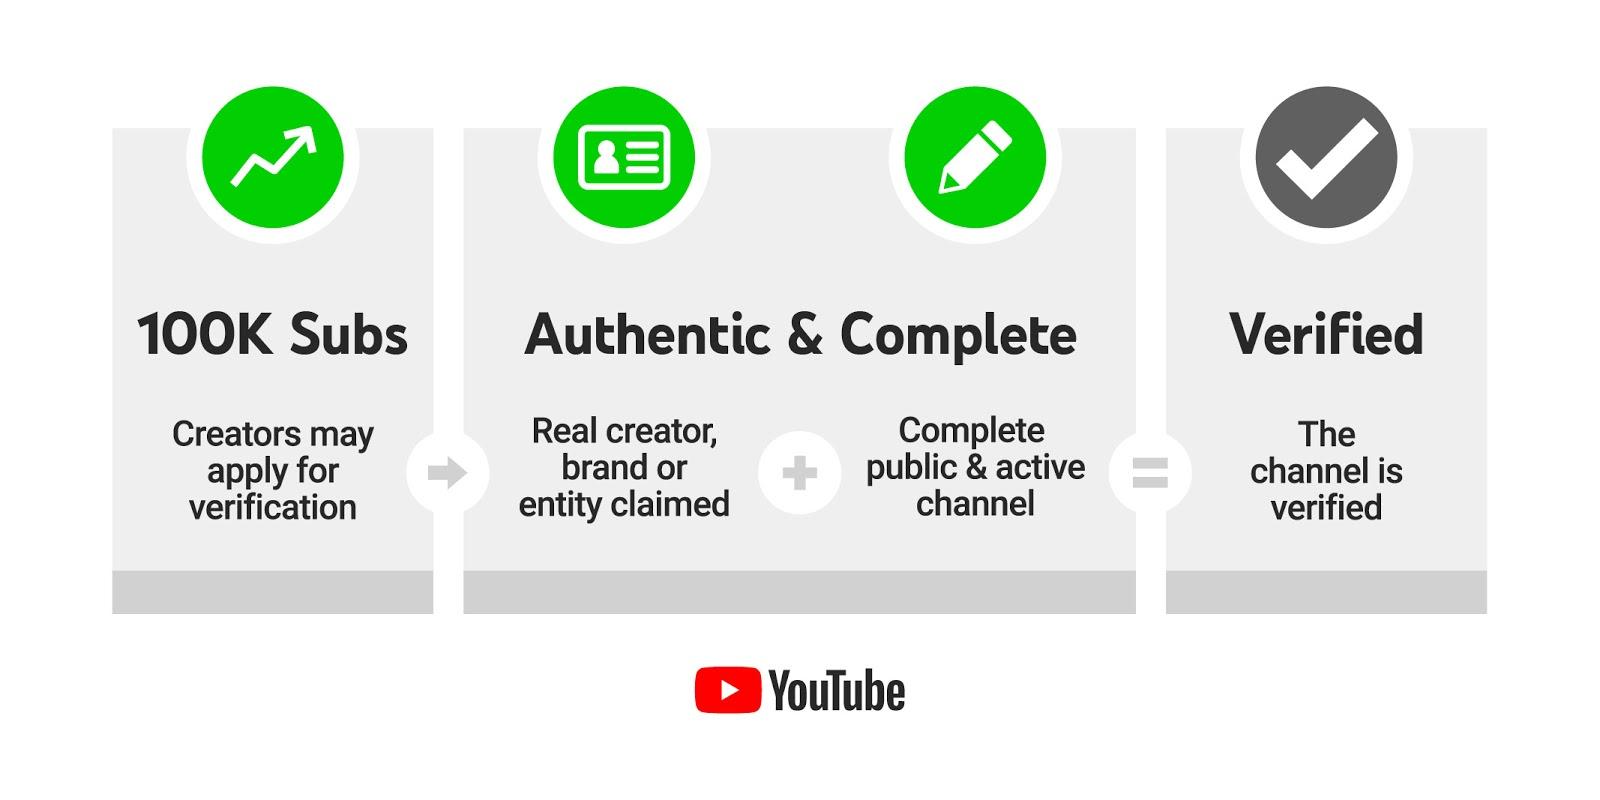 YouTube อัพเดทการยืนยันตัวตน และเปลี่ยนเครื่องหมายใหม่ - InDigital